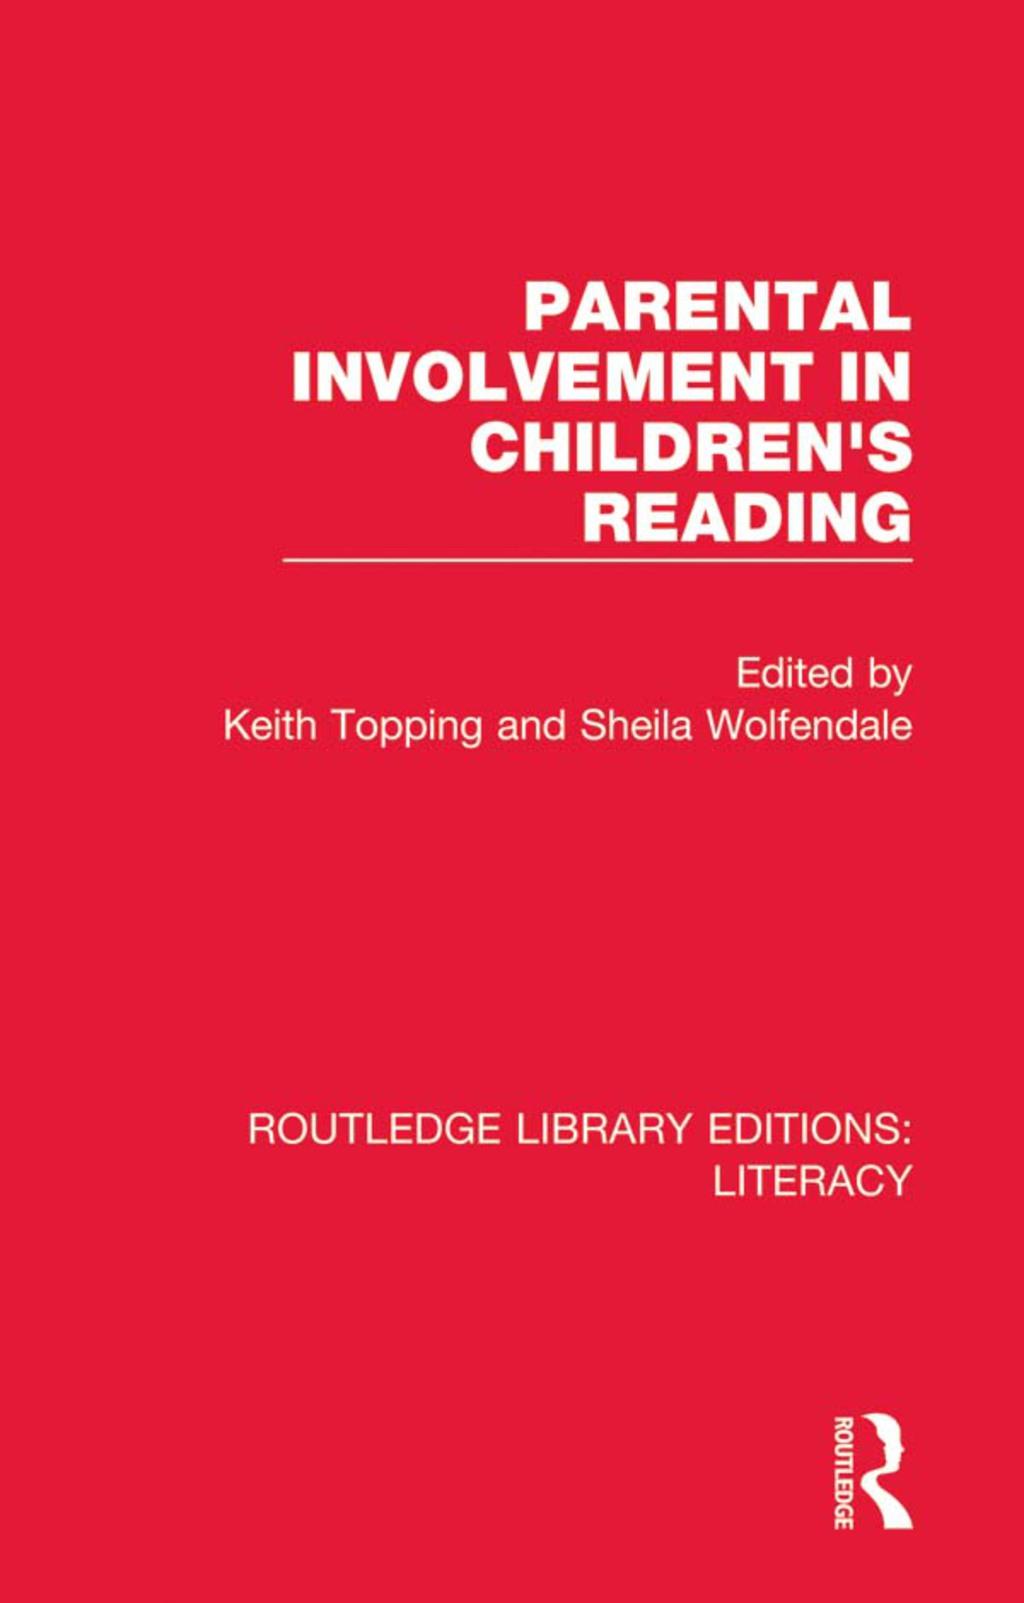 Parental Involvement in Children's Reading (eBook Rental)